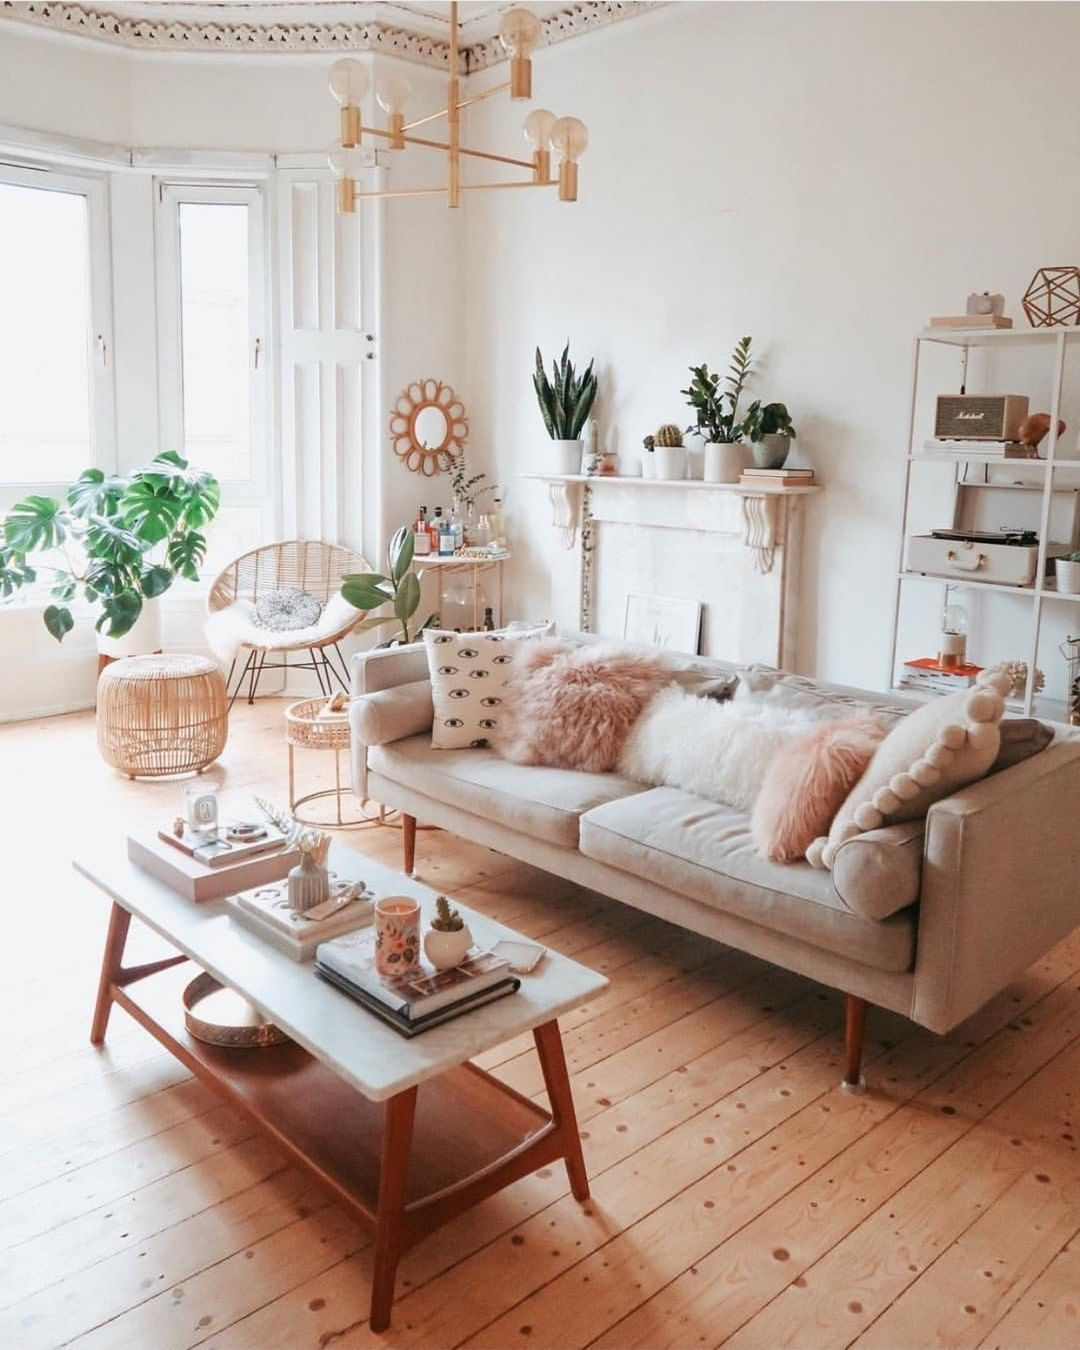 neutral cream tan and peach decor bohemian chic room decor apartment living room on boho chic decor living room bohemian kitchen id=77485